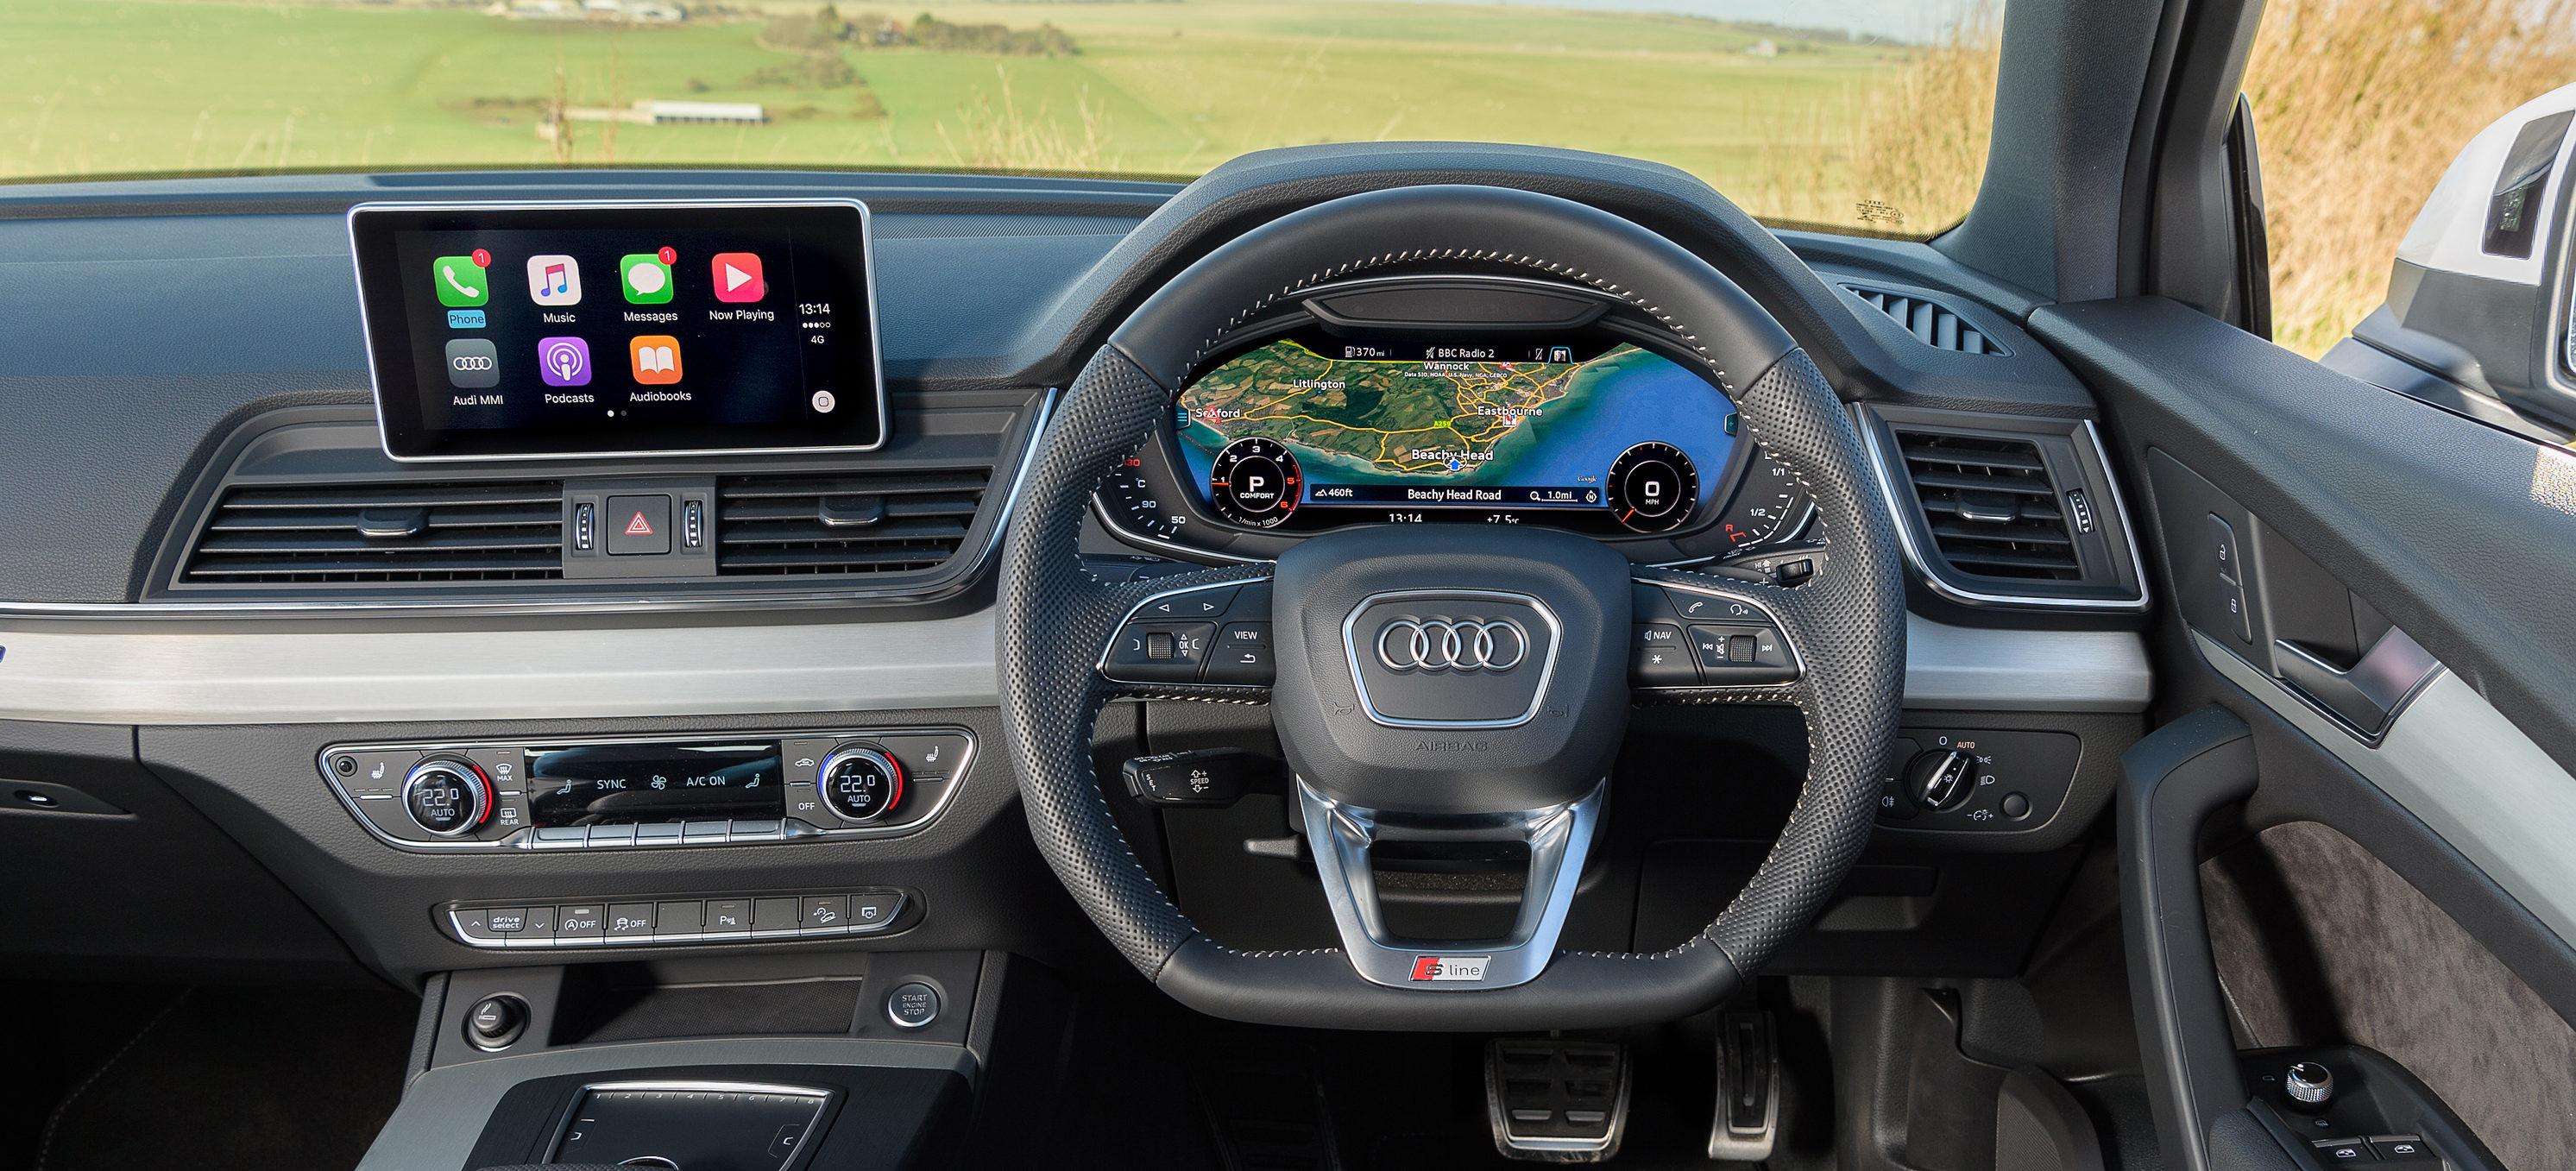 Audi Q5 Interior & Infotainment | carwow